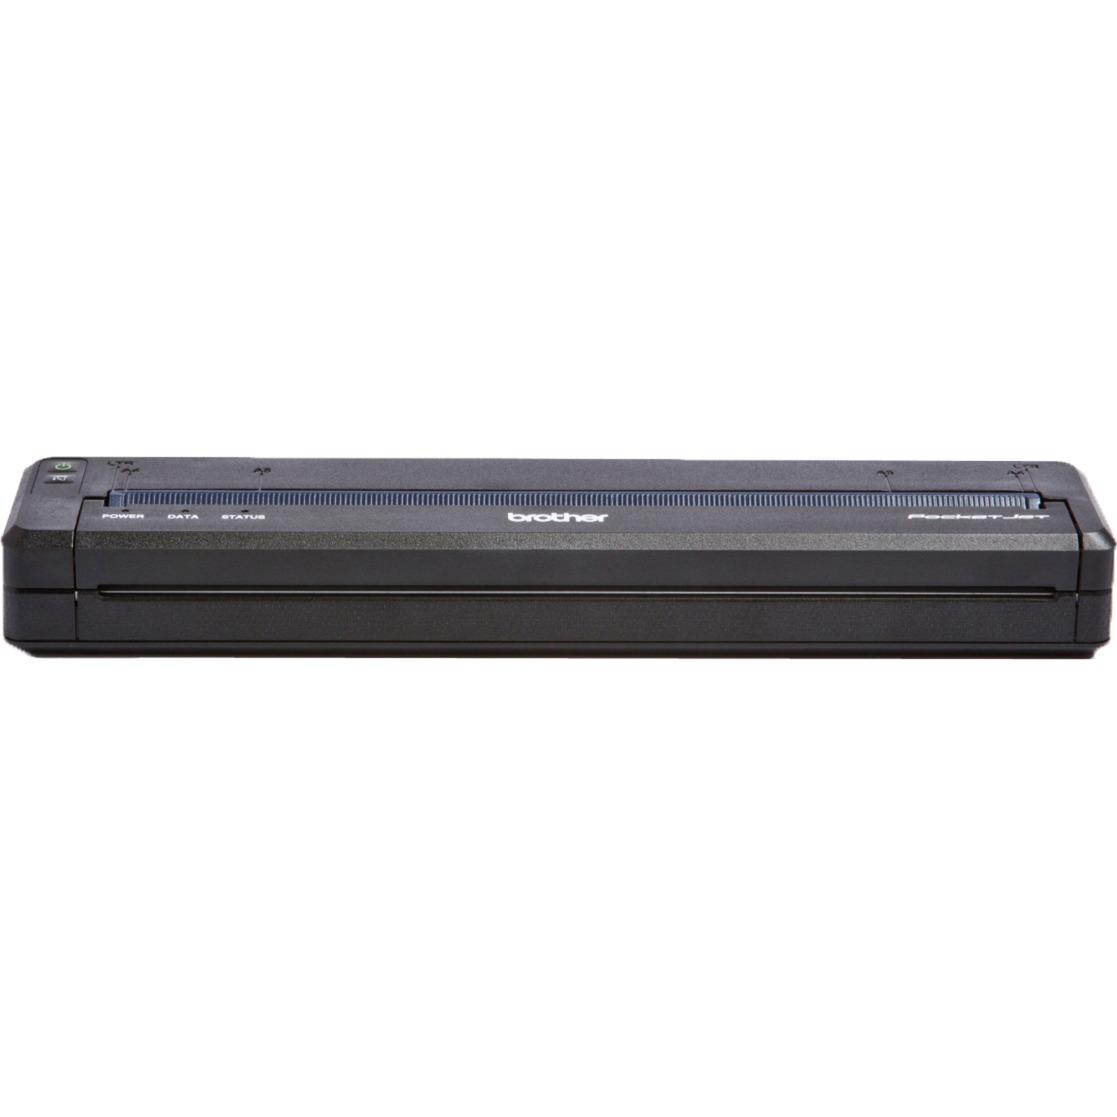 PJ- 722 A4 200dpi, Impresora térmica